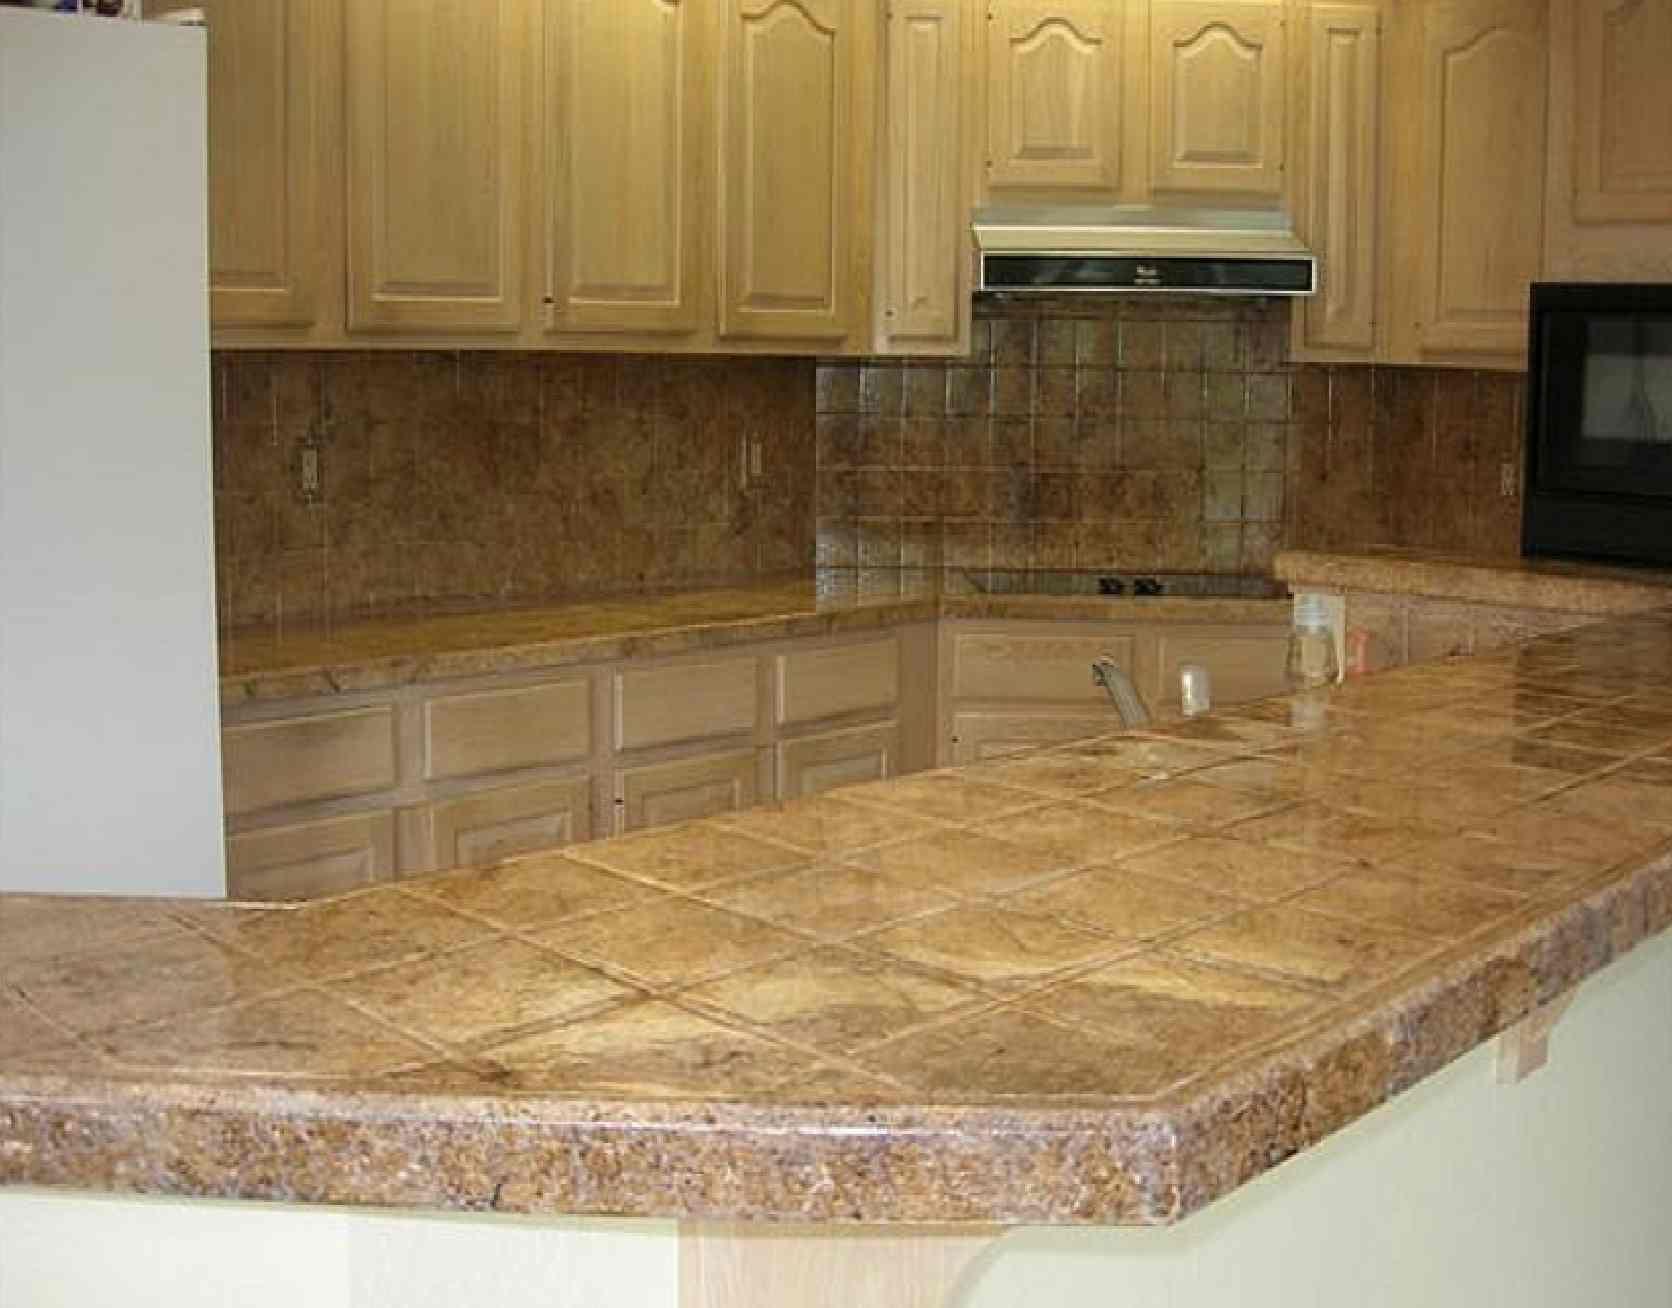 kitchen counter ideas kitchen countertops Tile Kitchen Countertop Design